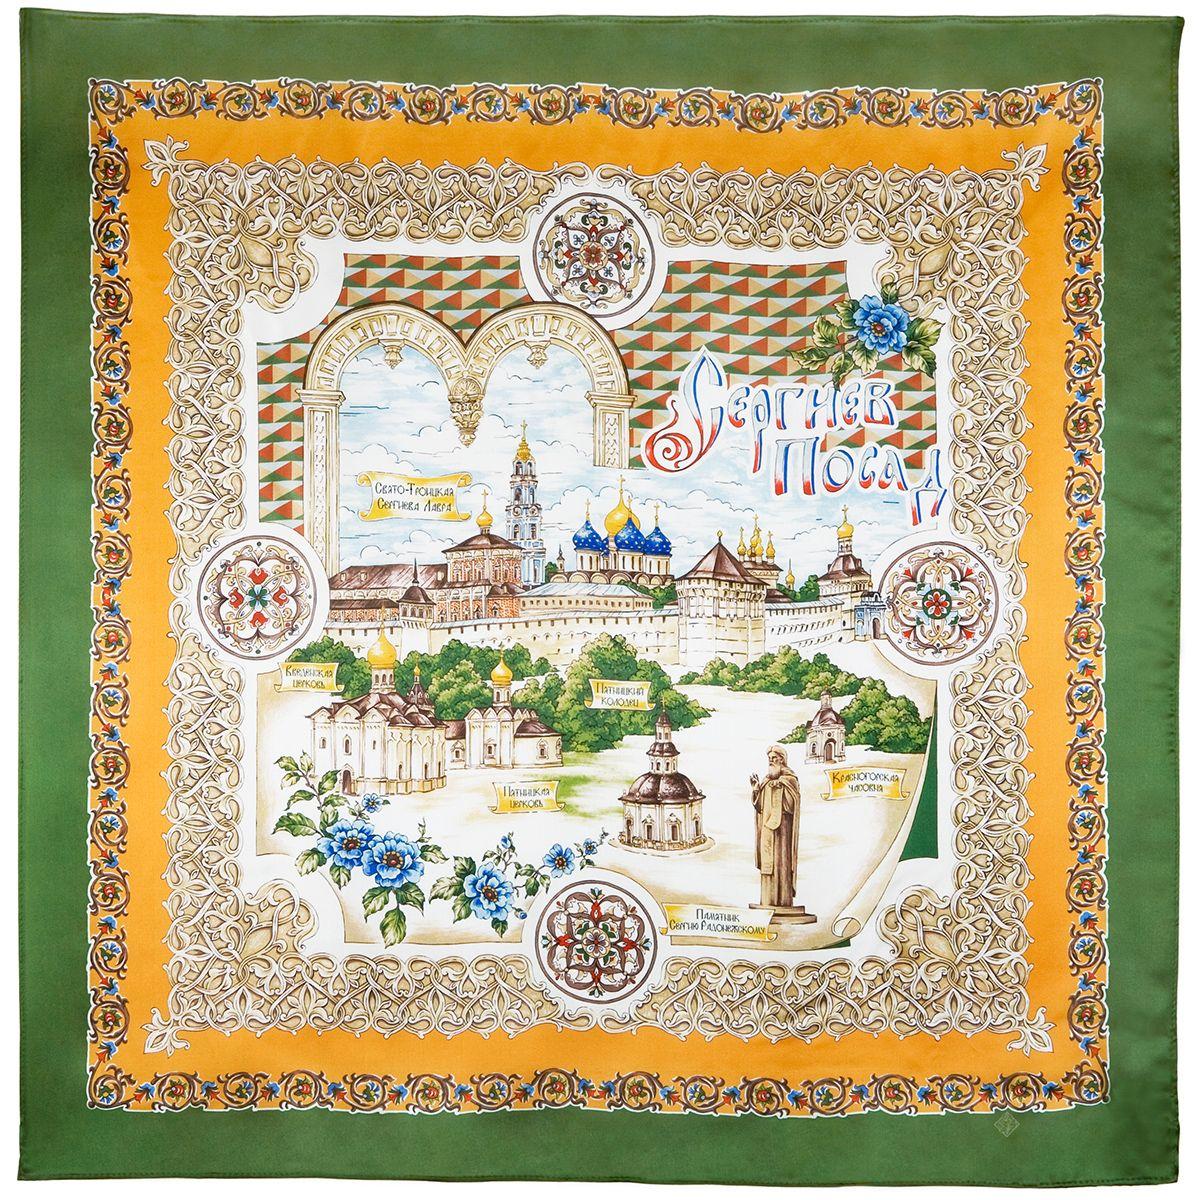 Платок «Троице-Сергиева Лавра»  10024-9